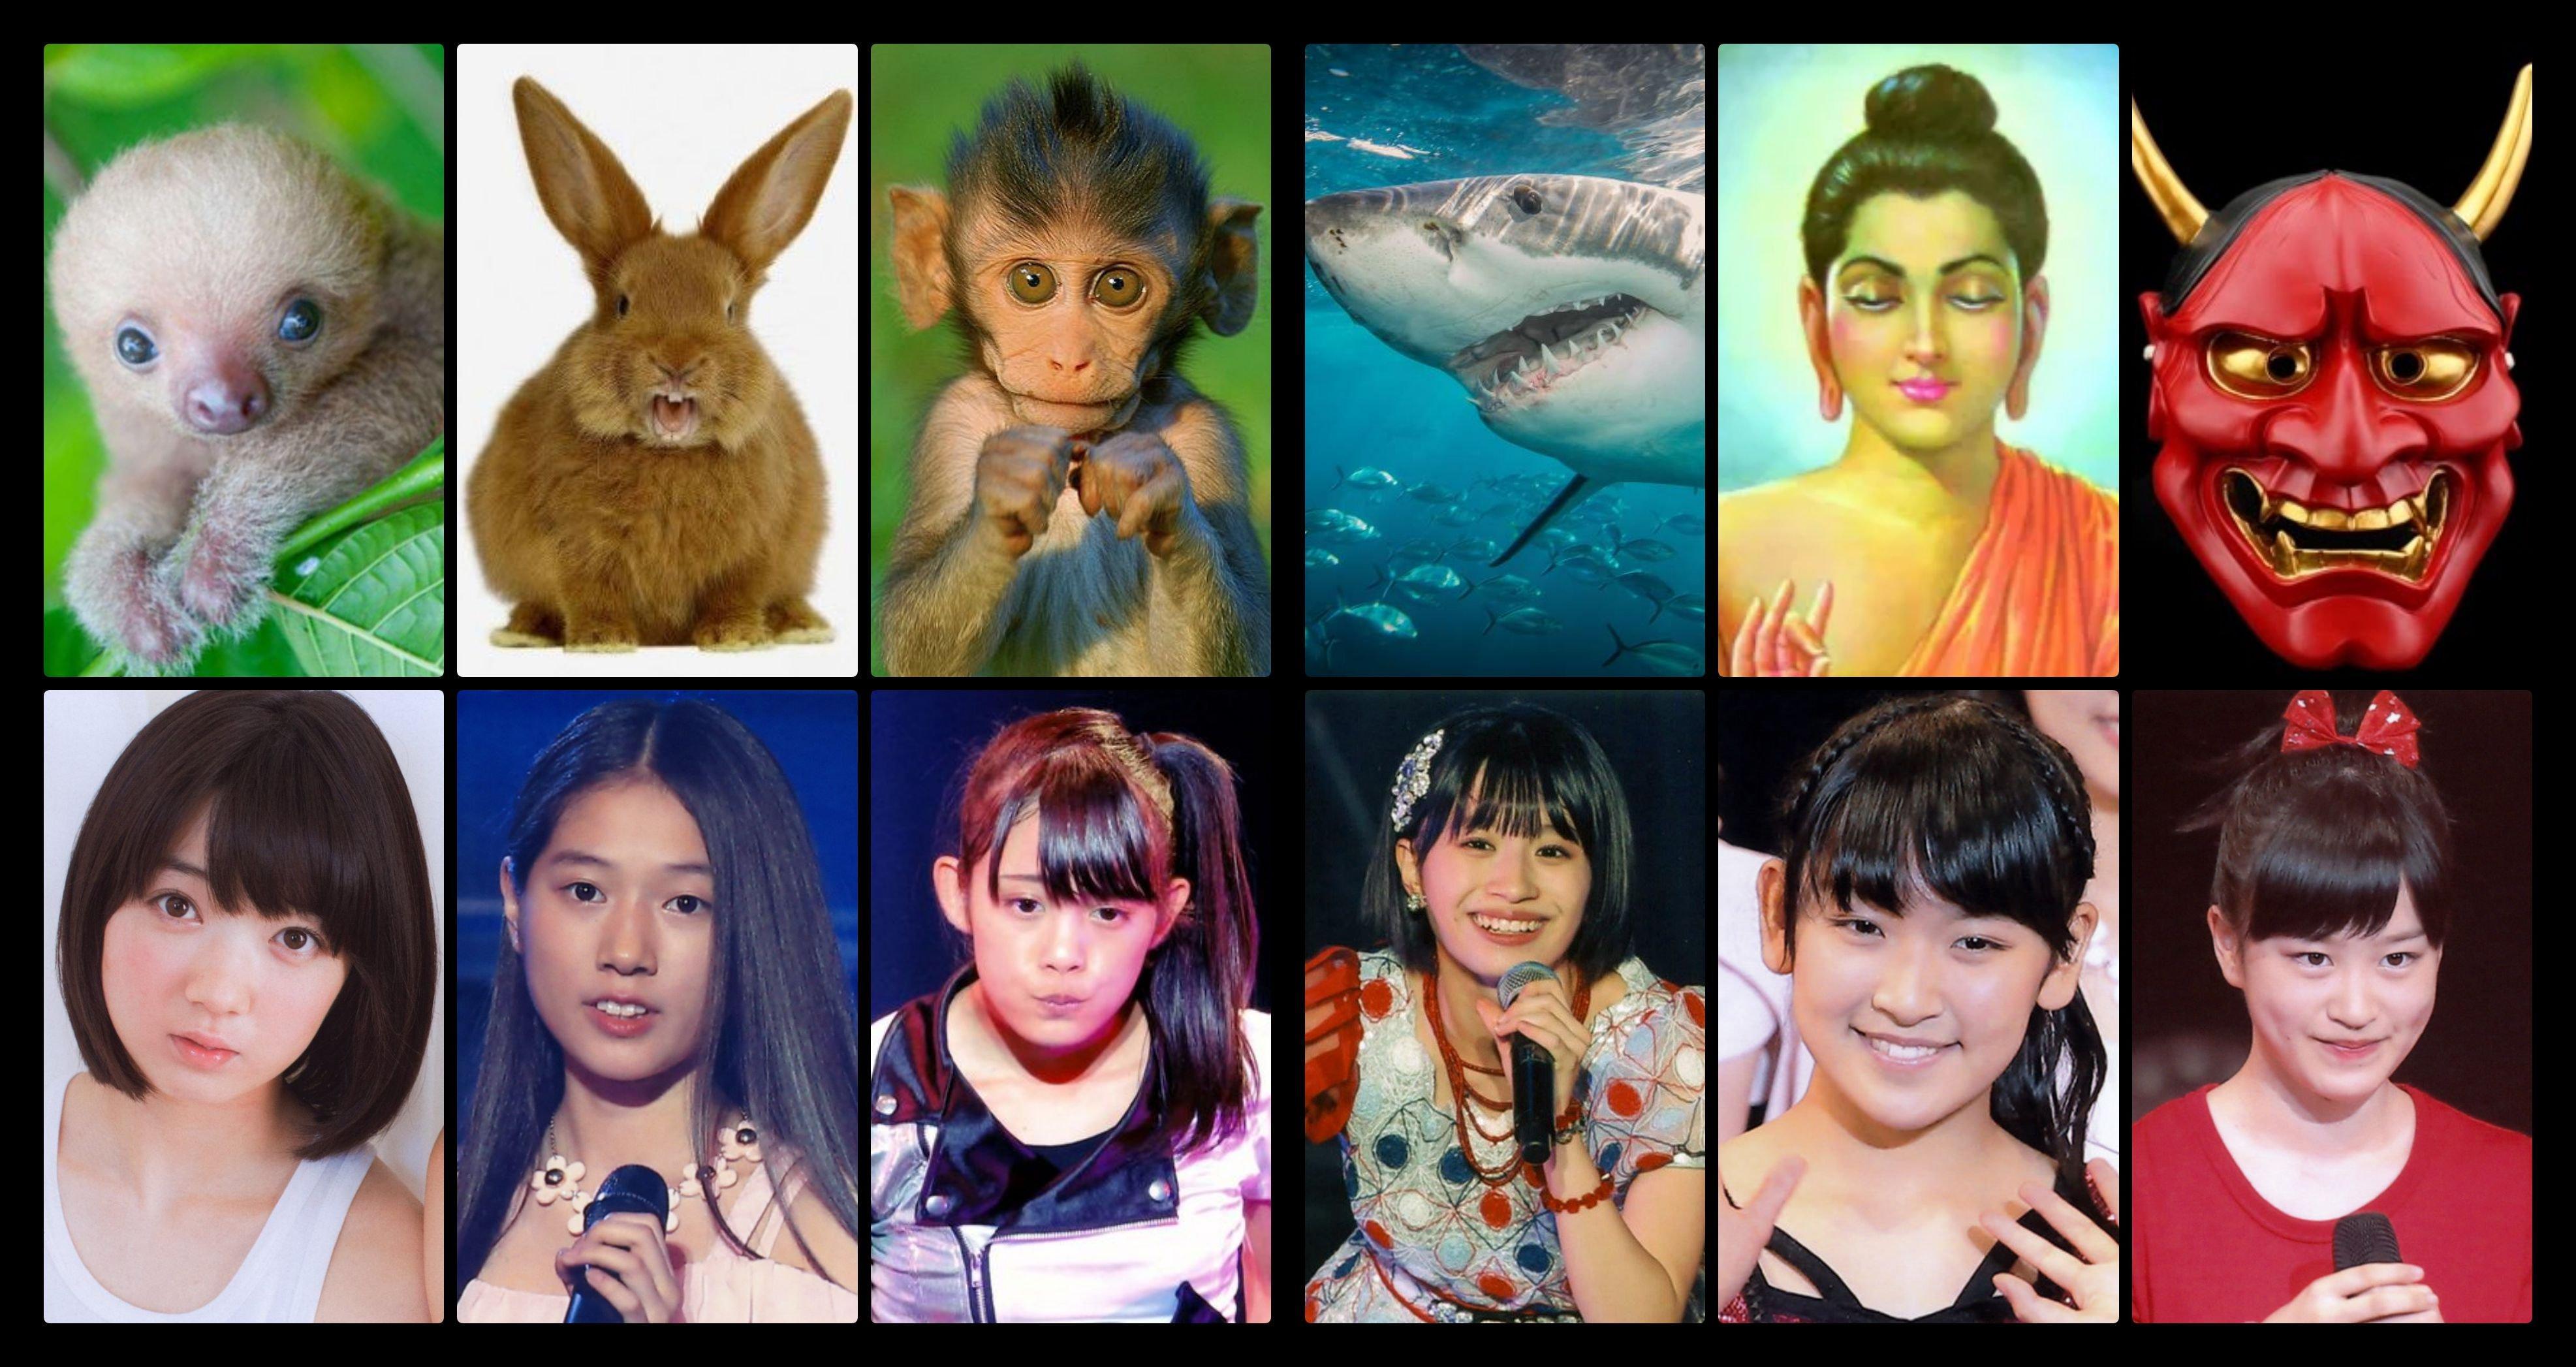 http://www.mybitchisajunky.com/whg/picture/HX0AtJ6_5c80239fb35e1.jpg